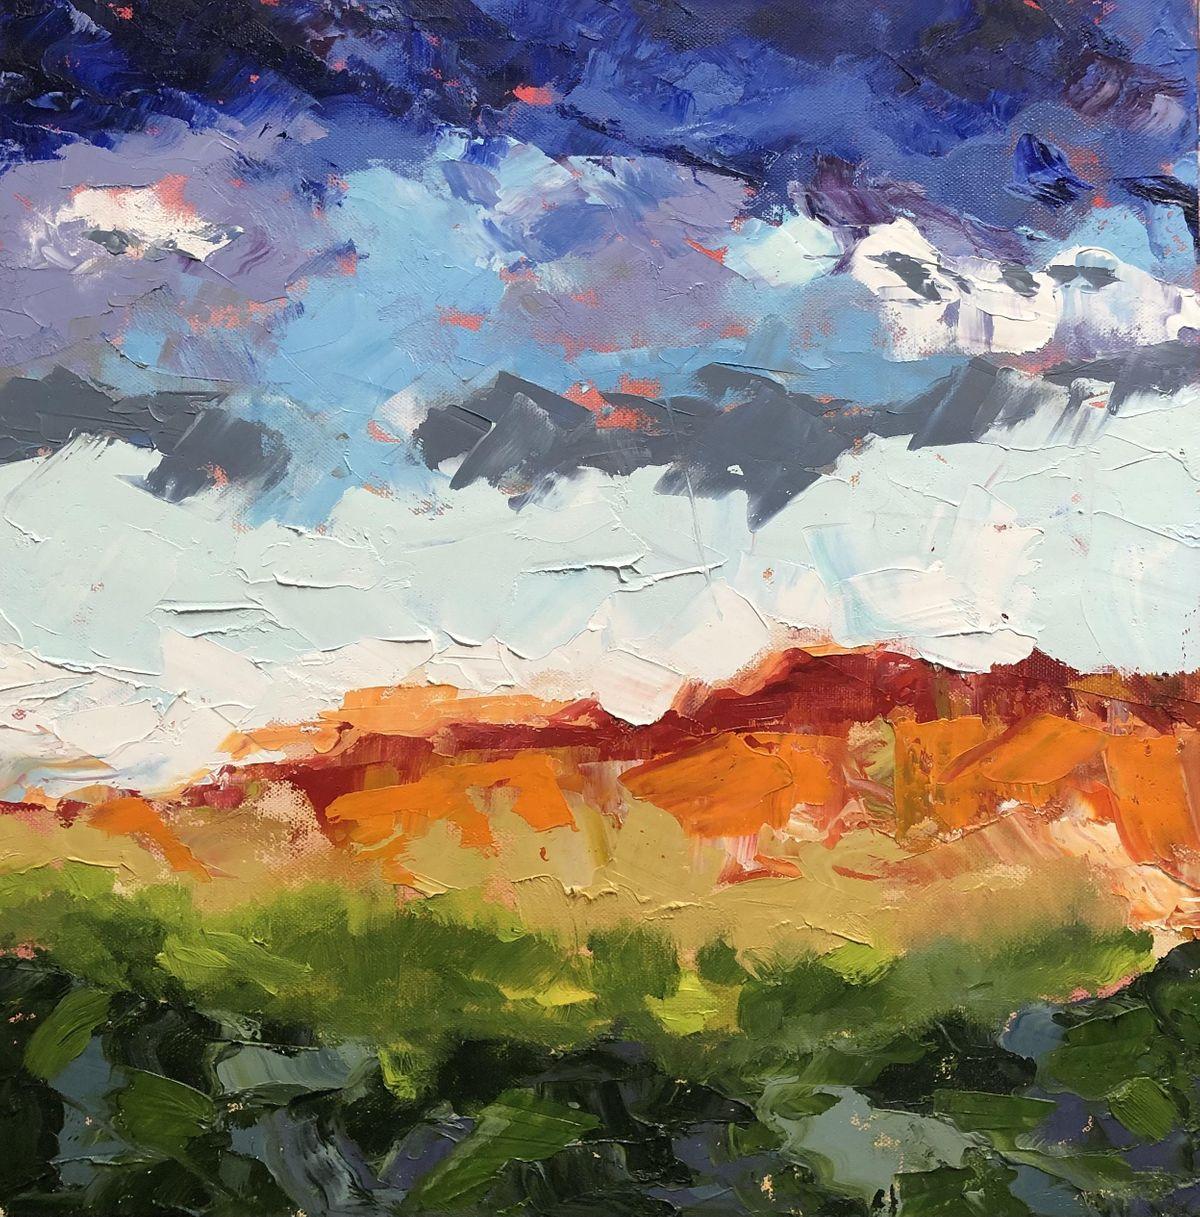 Class 54. Painting for the Adventurous\u2014Go Abstract   Sharon Carol Demery